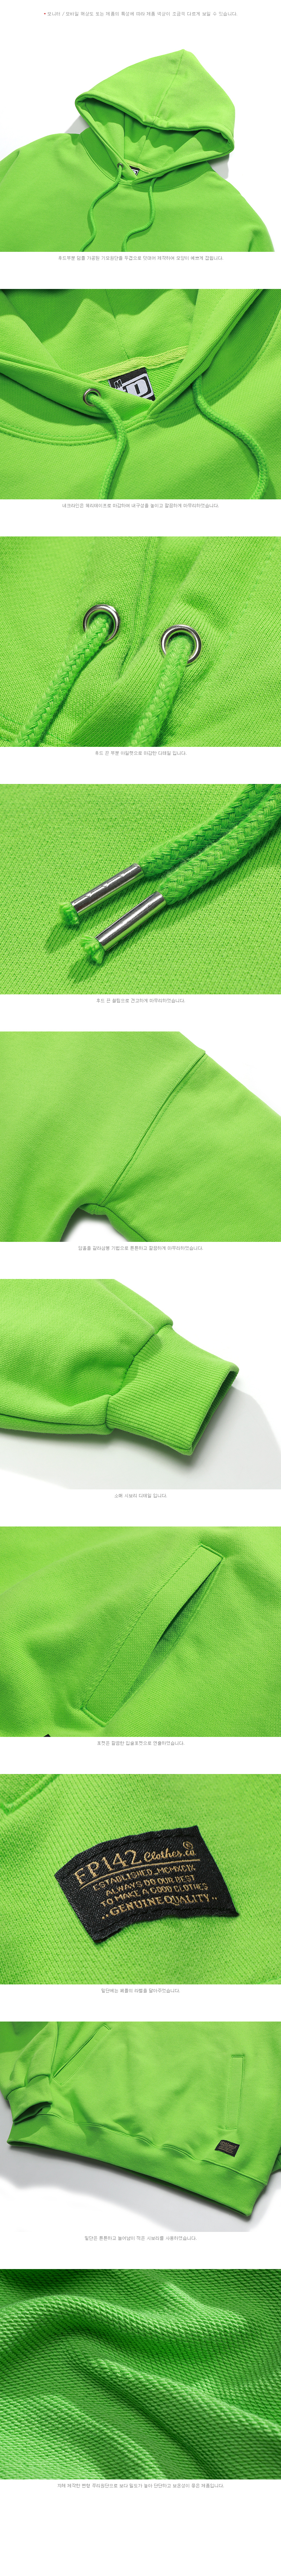 4_KHHD1189_detail_yellowgreen_02.jpg